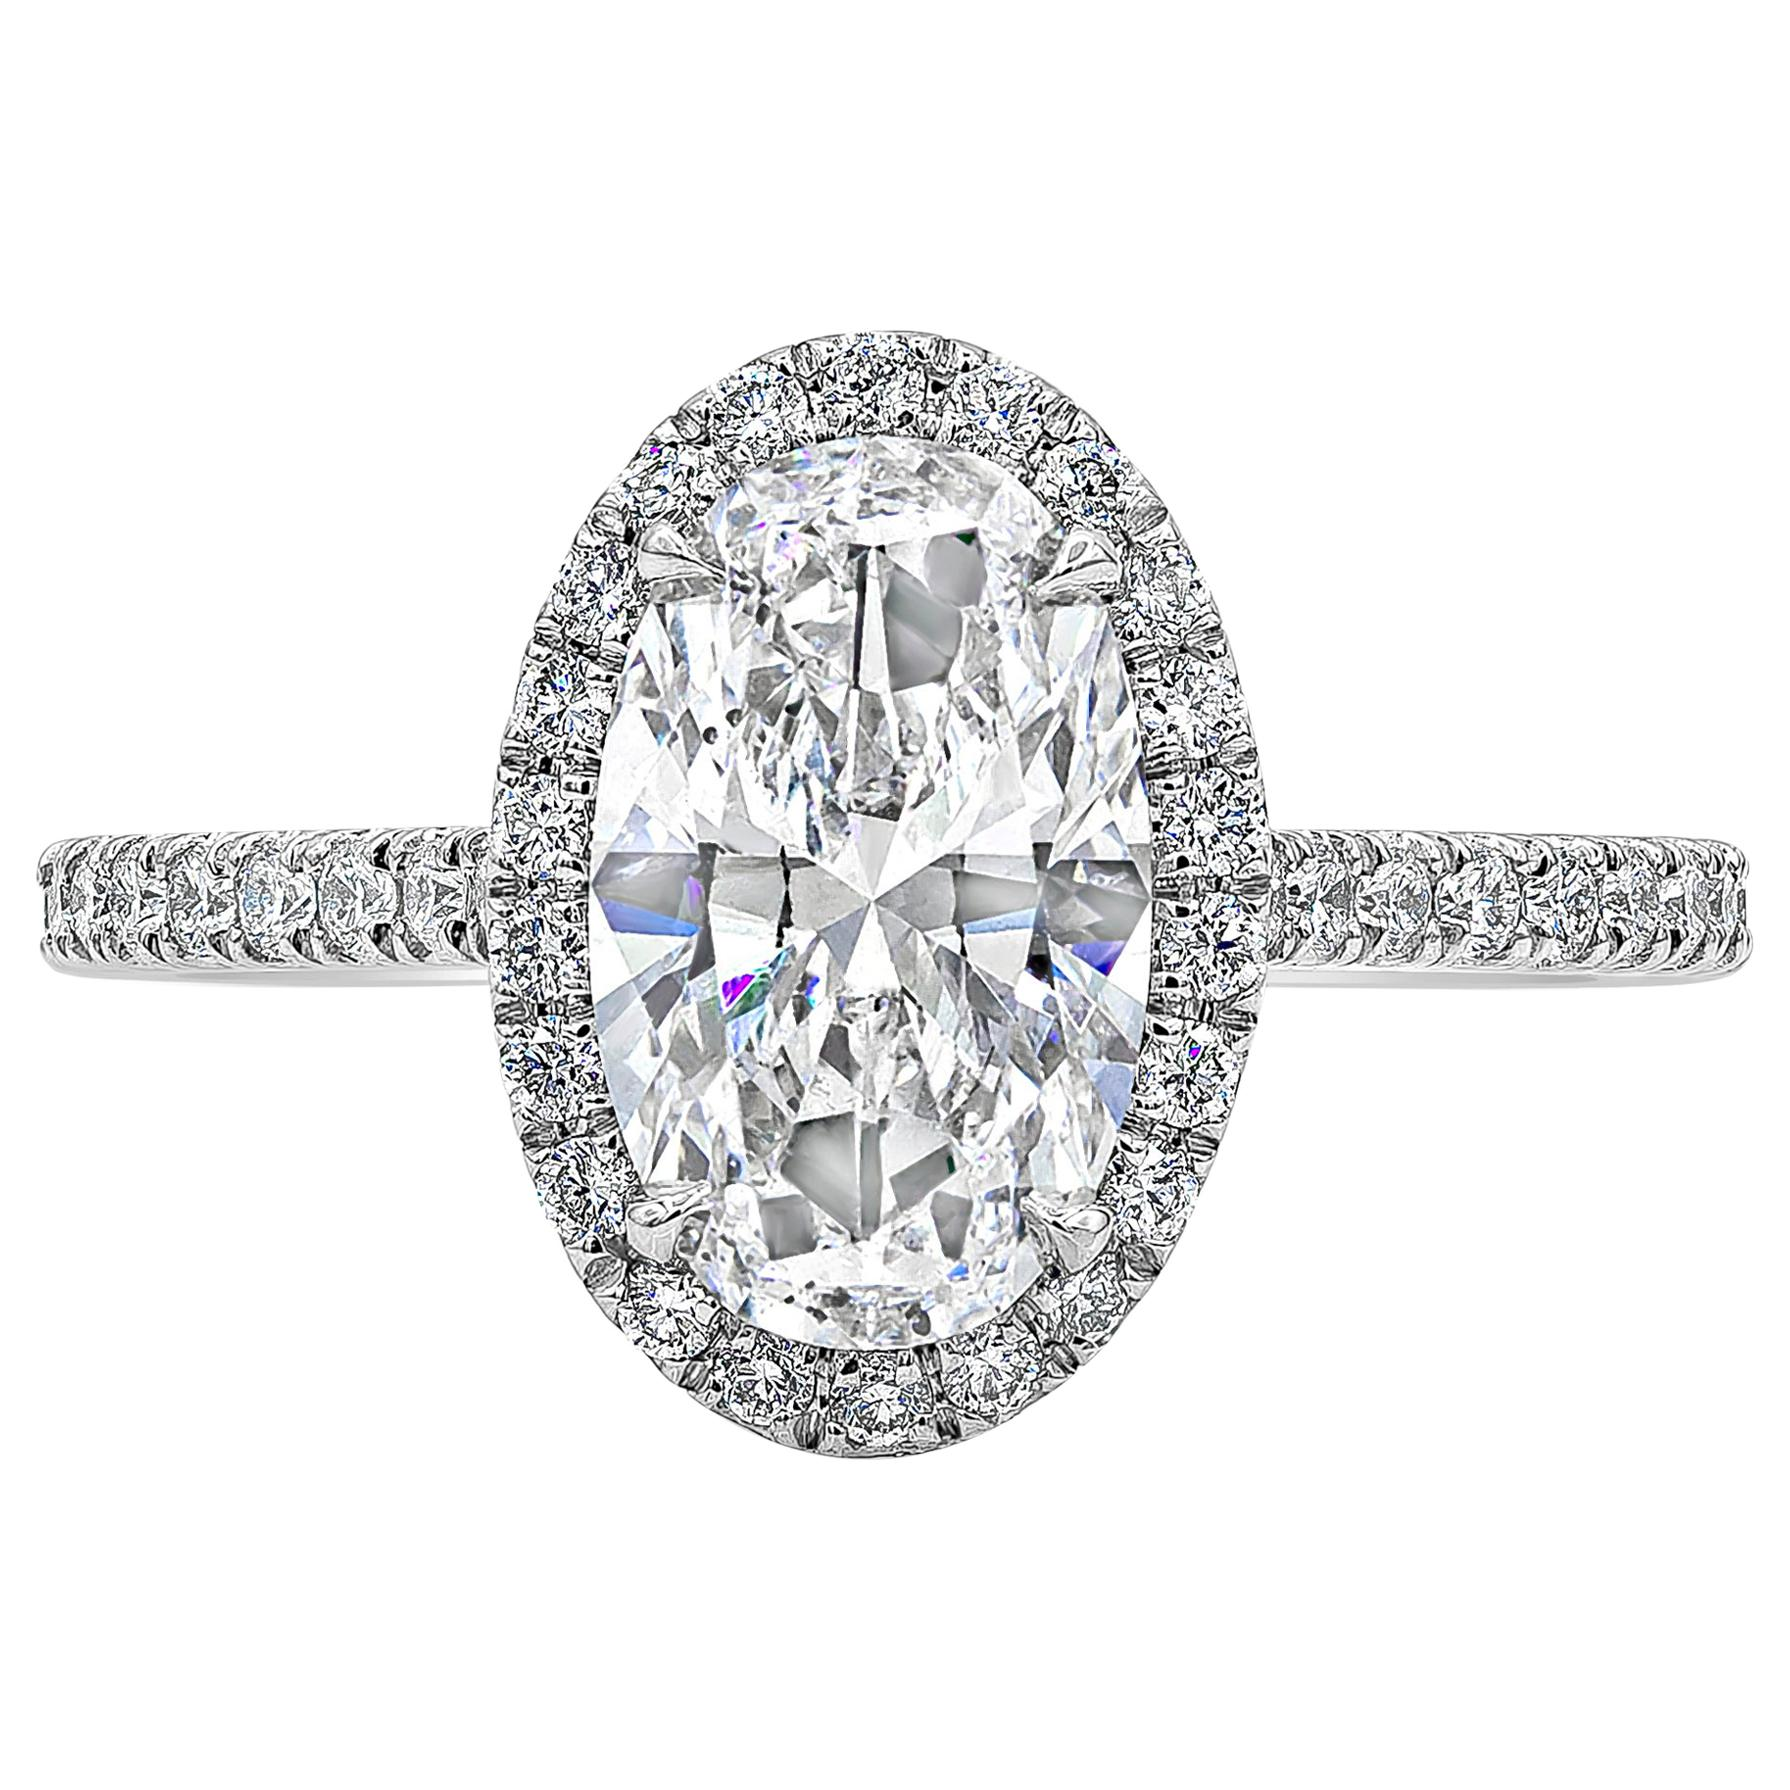 Roman Malakov, GIA Certified Oval Cut Diamond Halo Engagement Ring